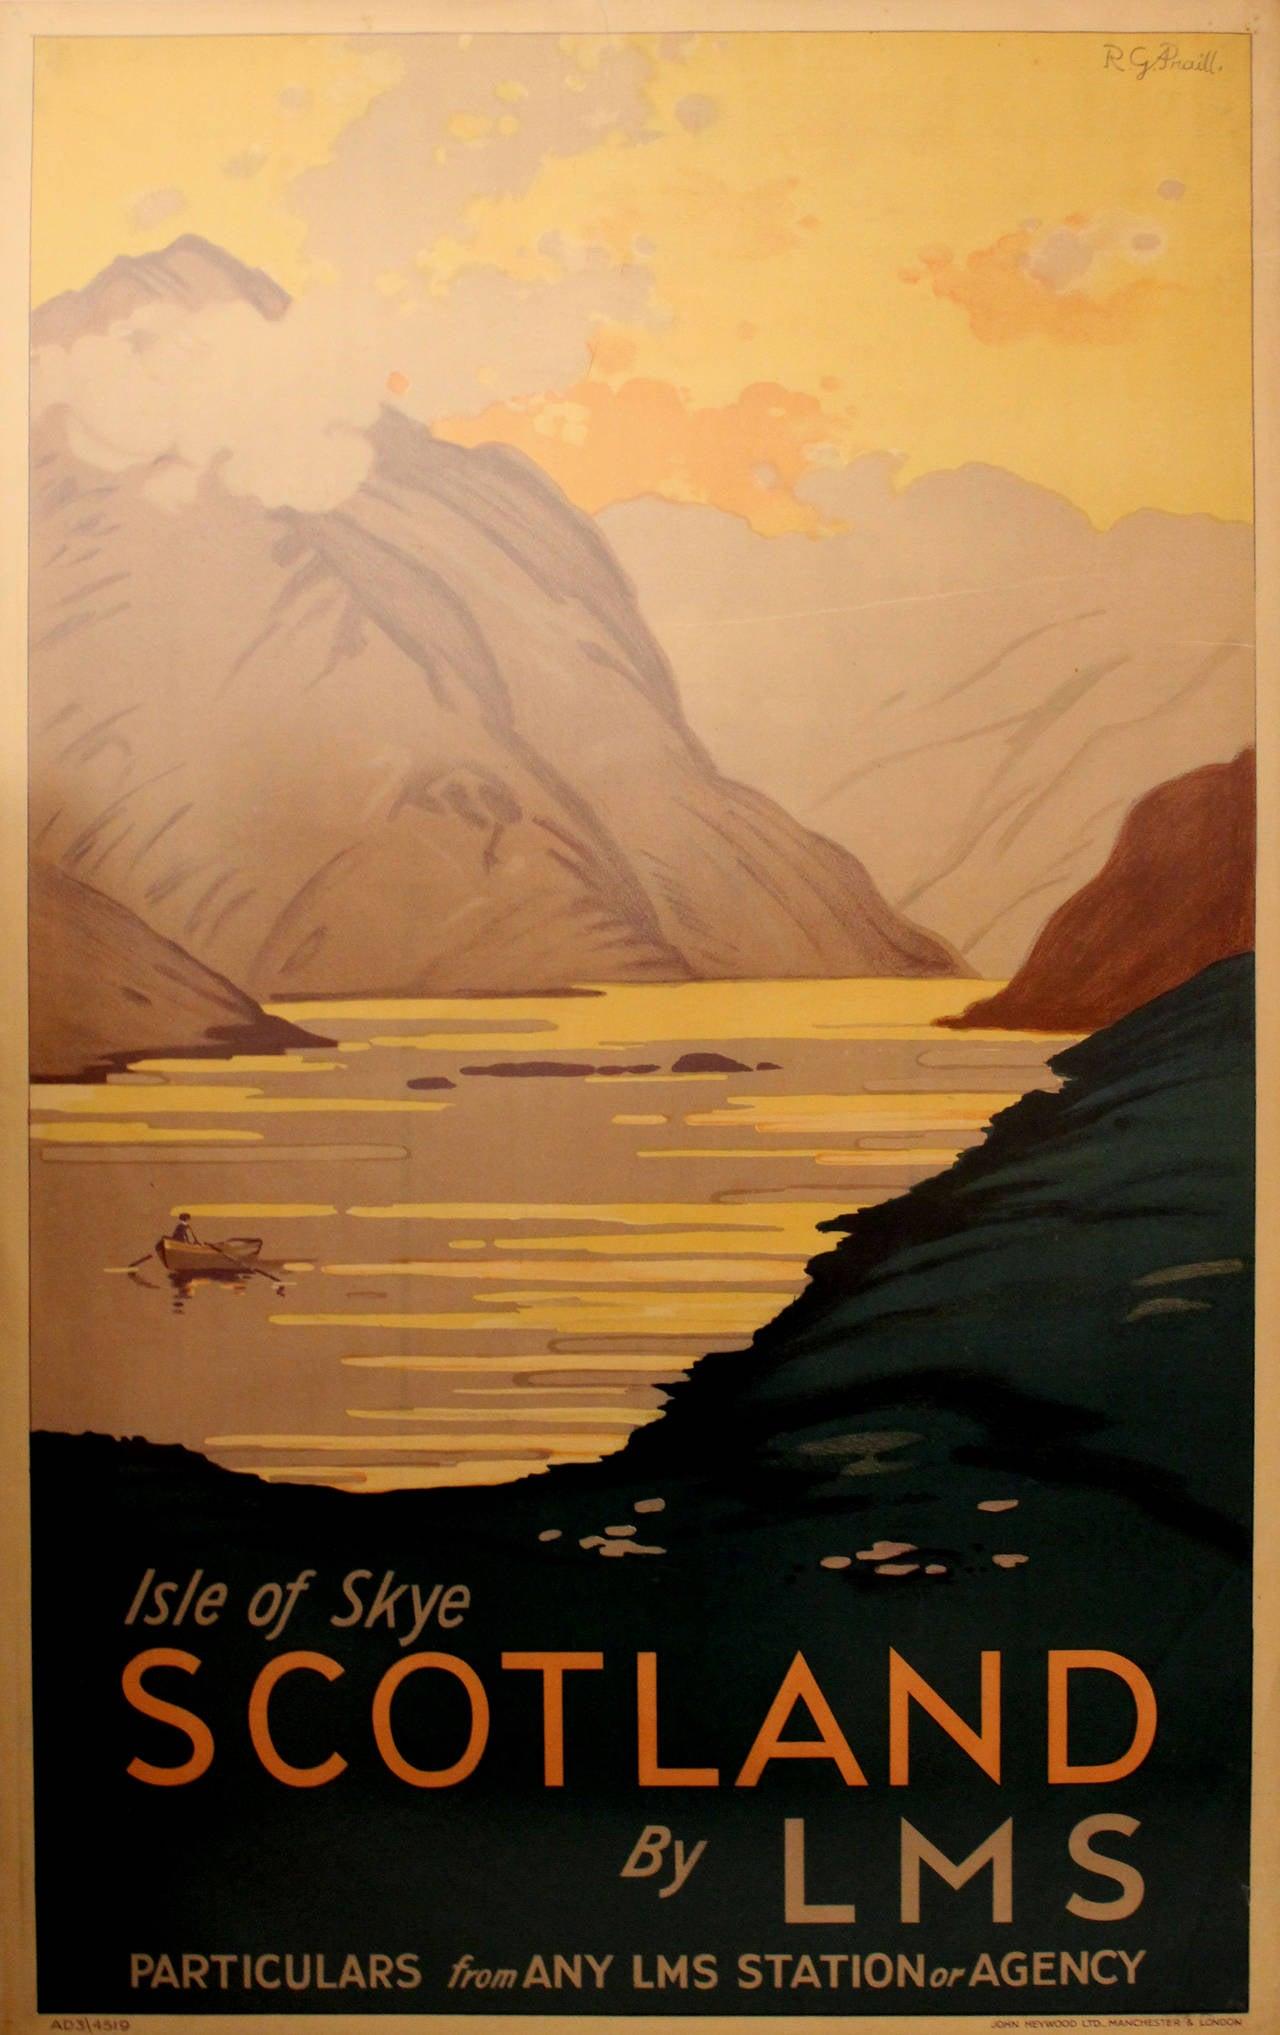 R.G. Praill - Original 1930s LMS Railway Travel Poster By ...